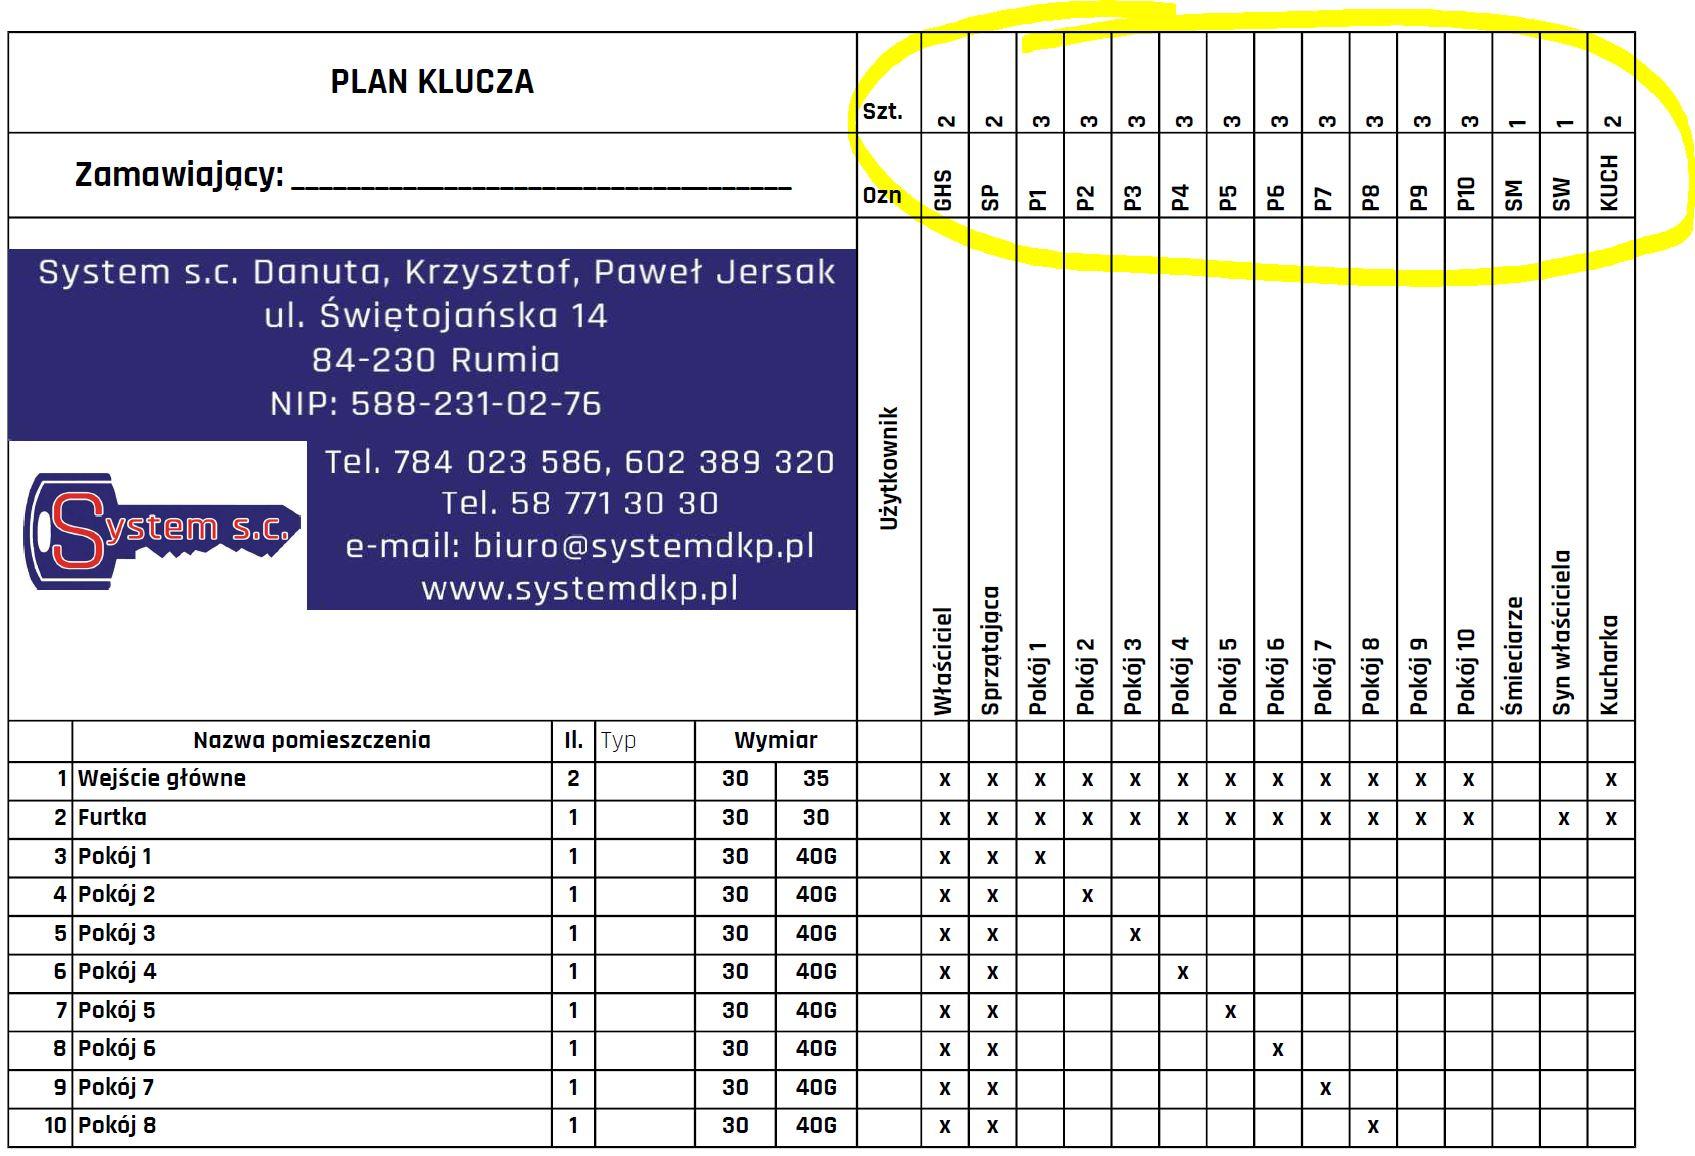 Plan%20klucza%20klucze.JPG